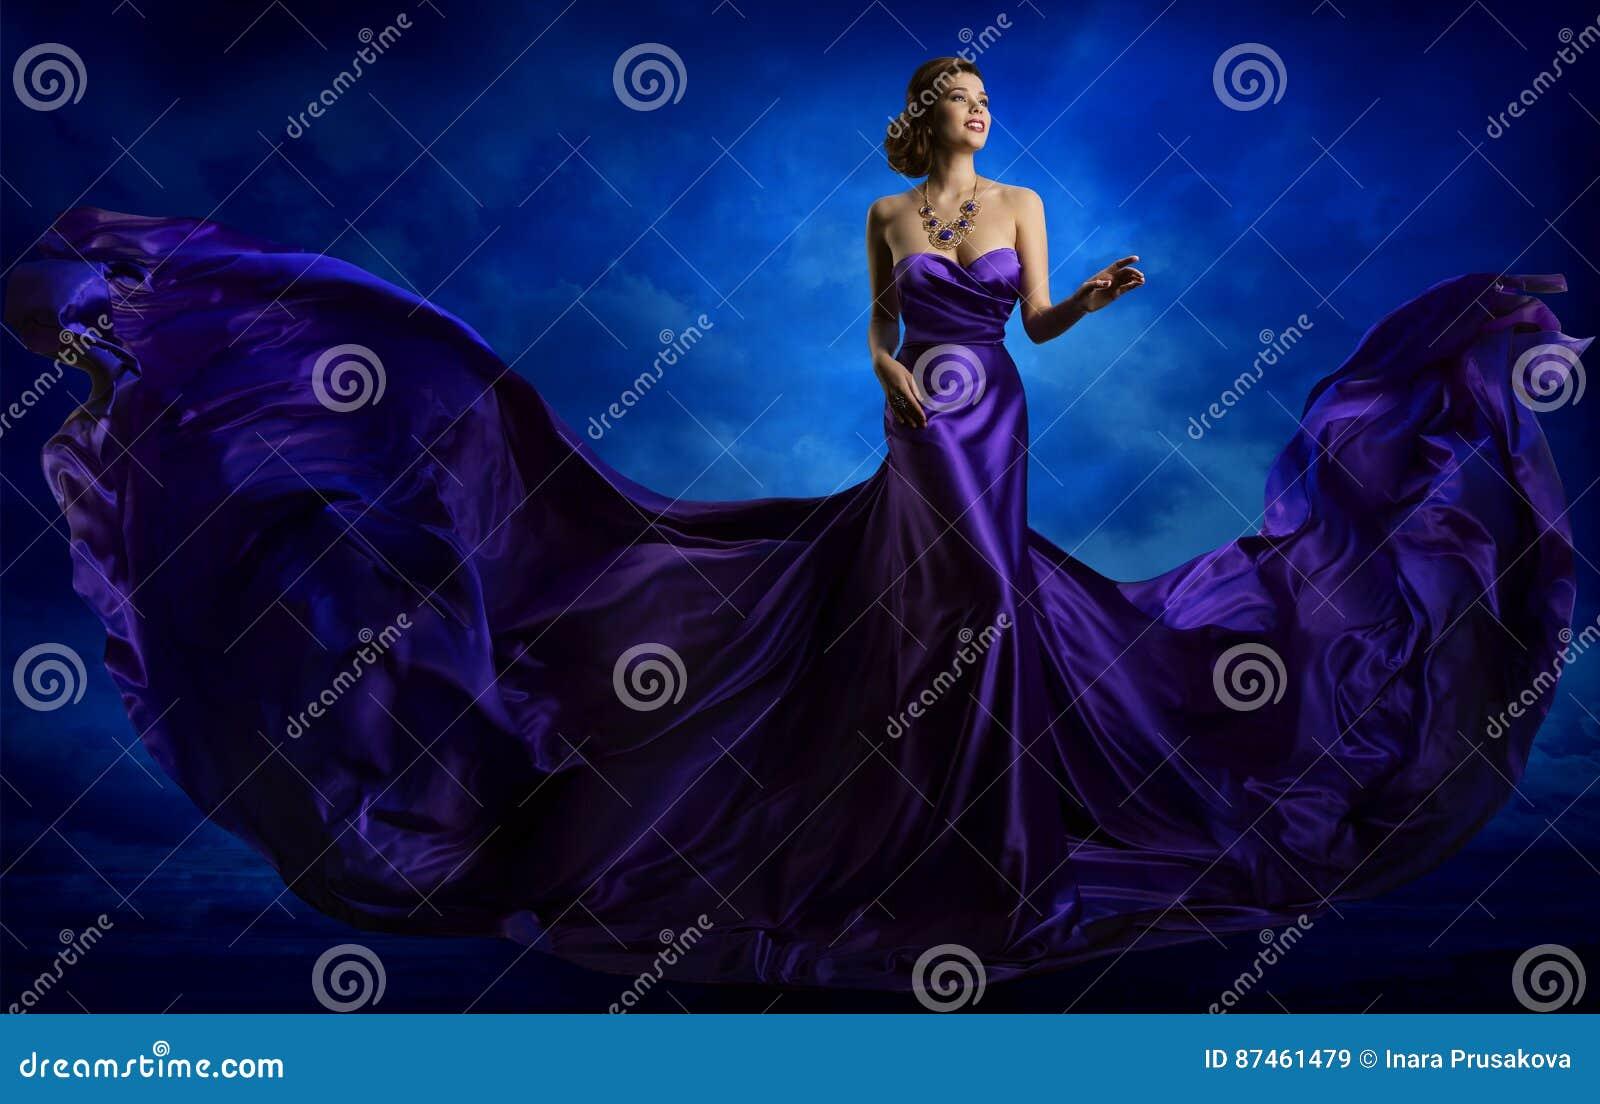 Woman Fashion Dress, Blue Art Gown Flying Waving Silk Fabric